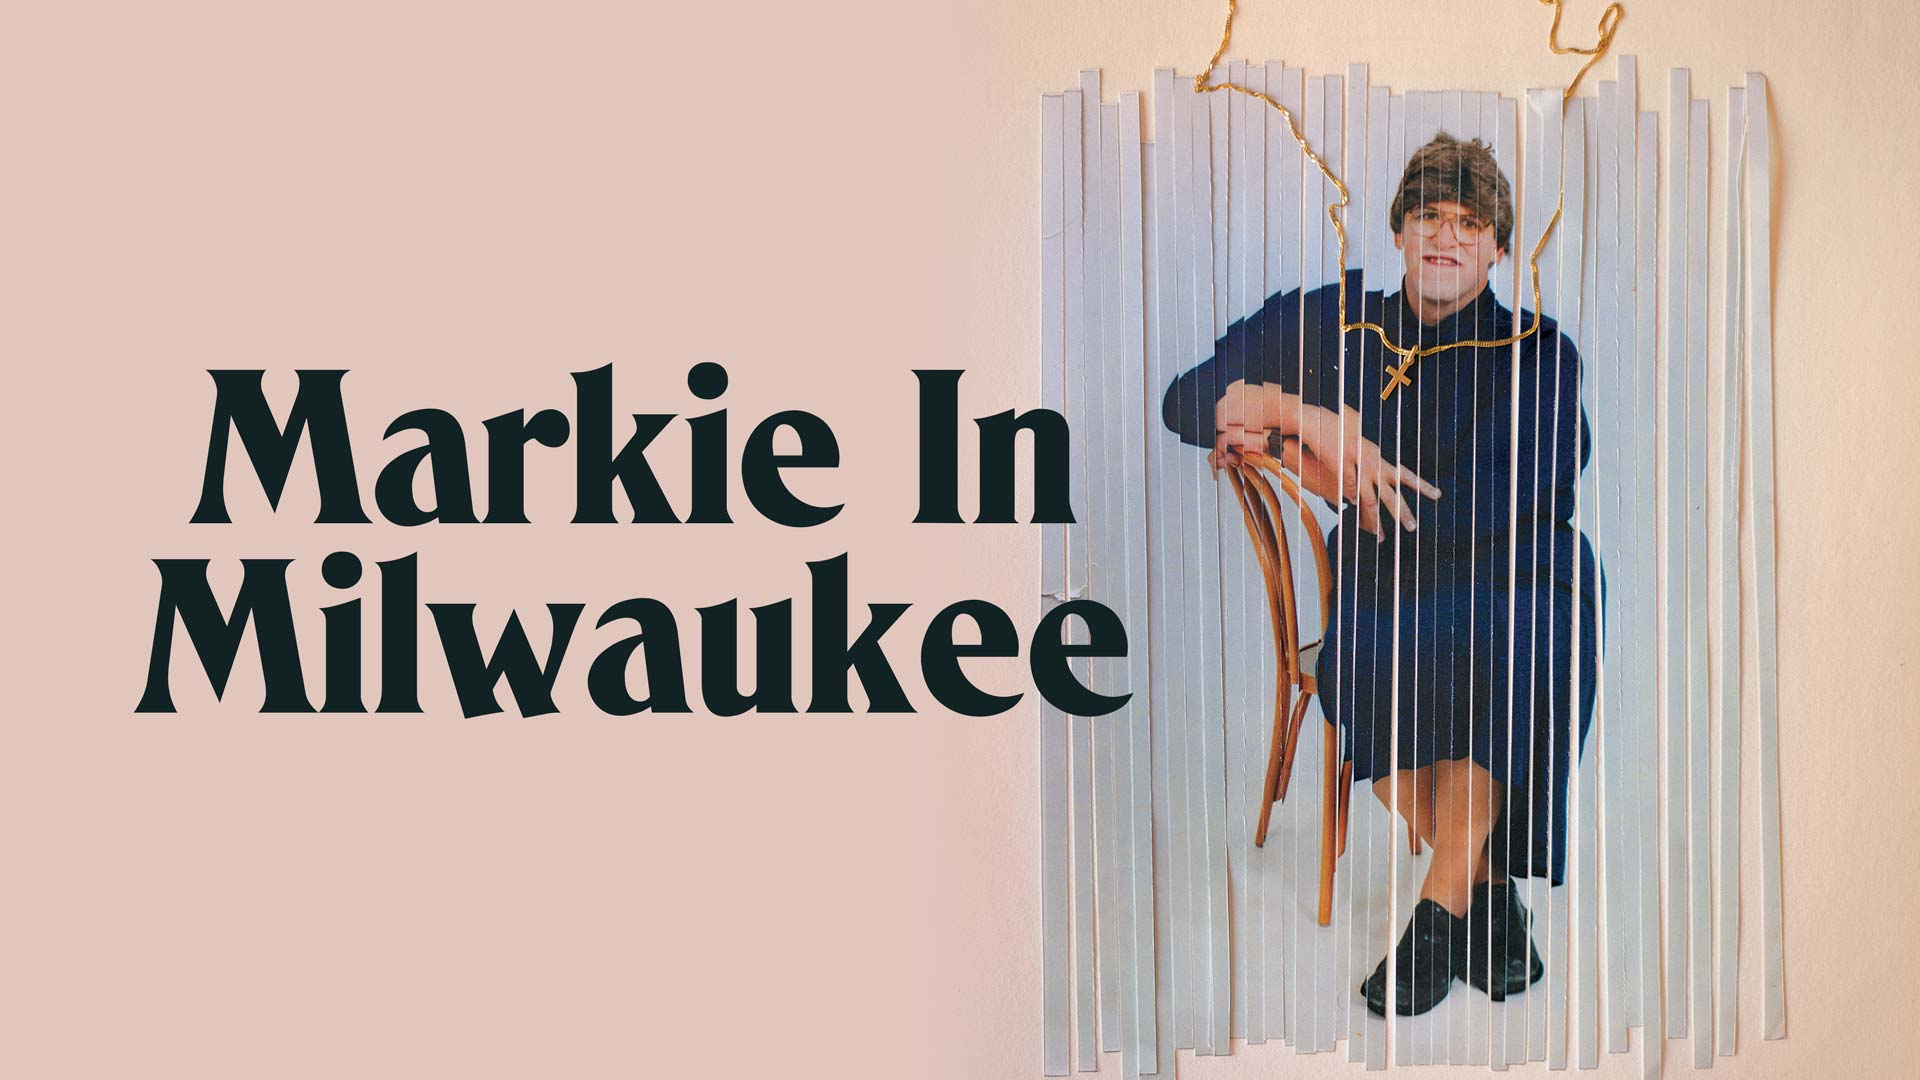 Markie in Milwaukee - image